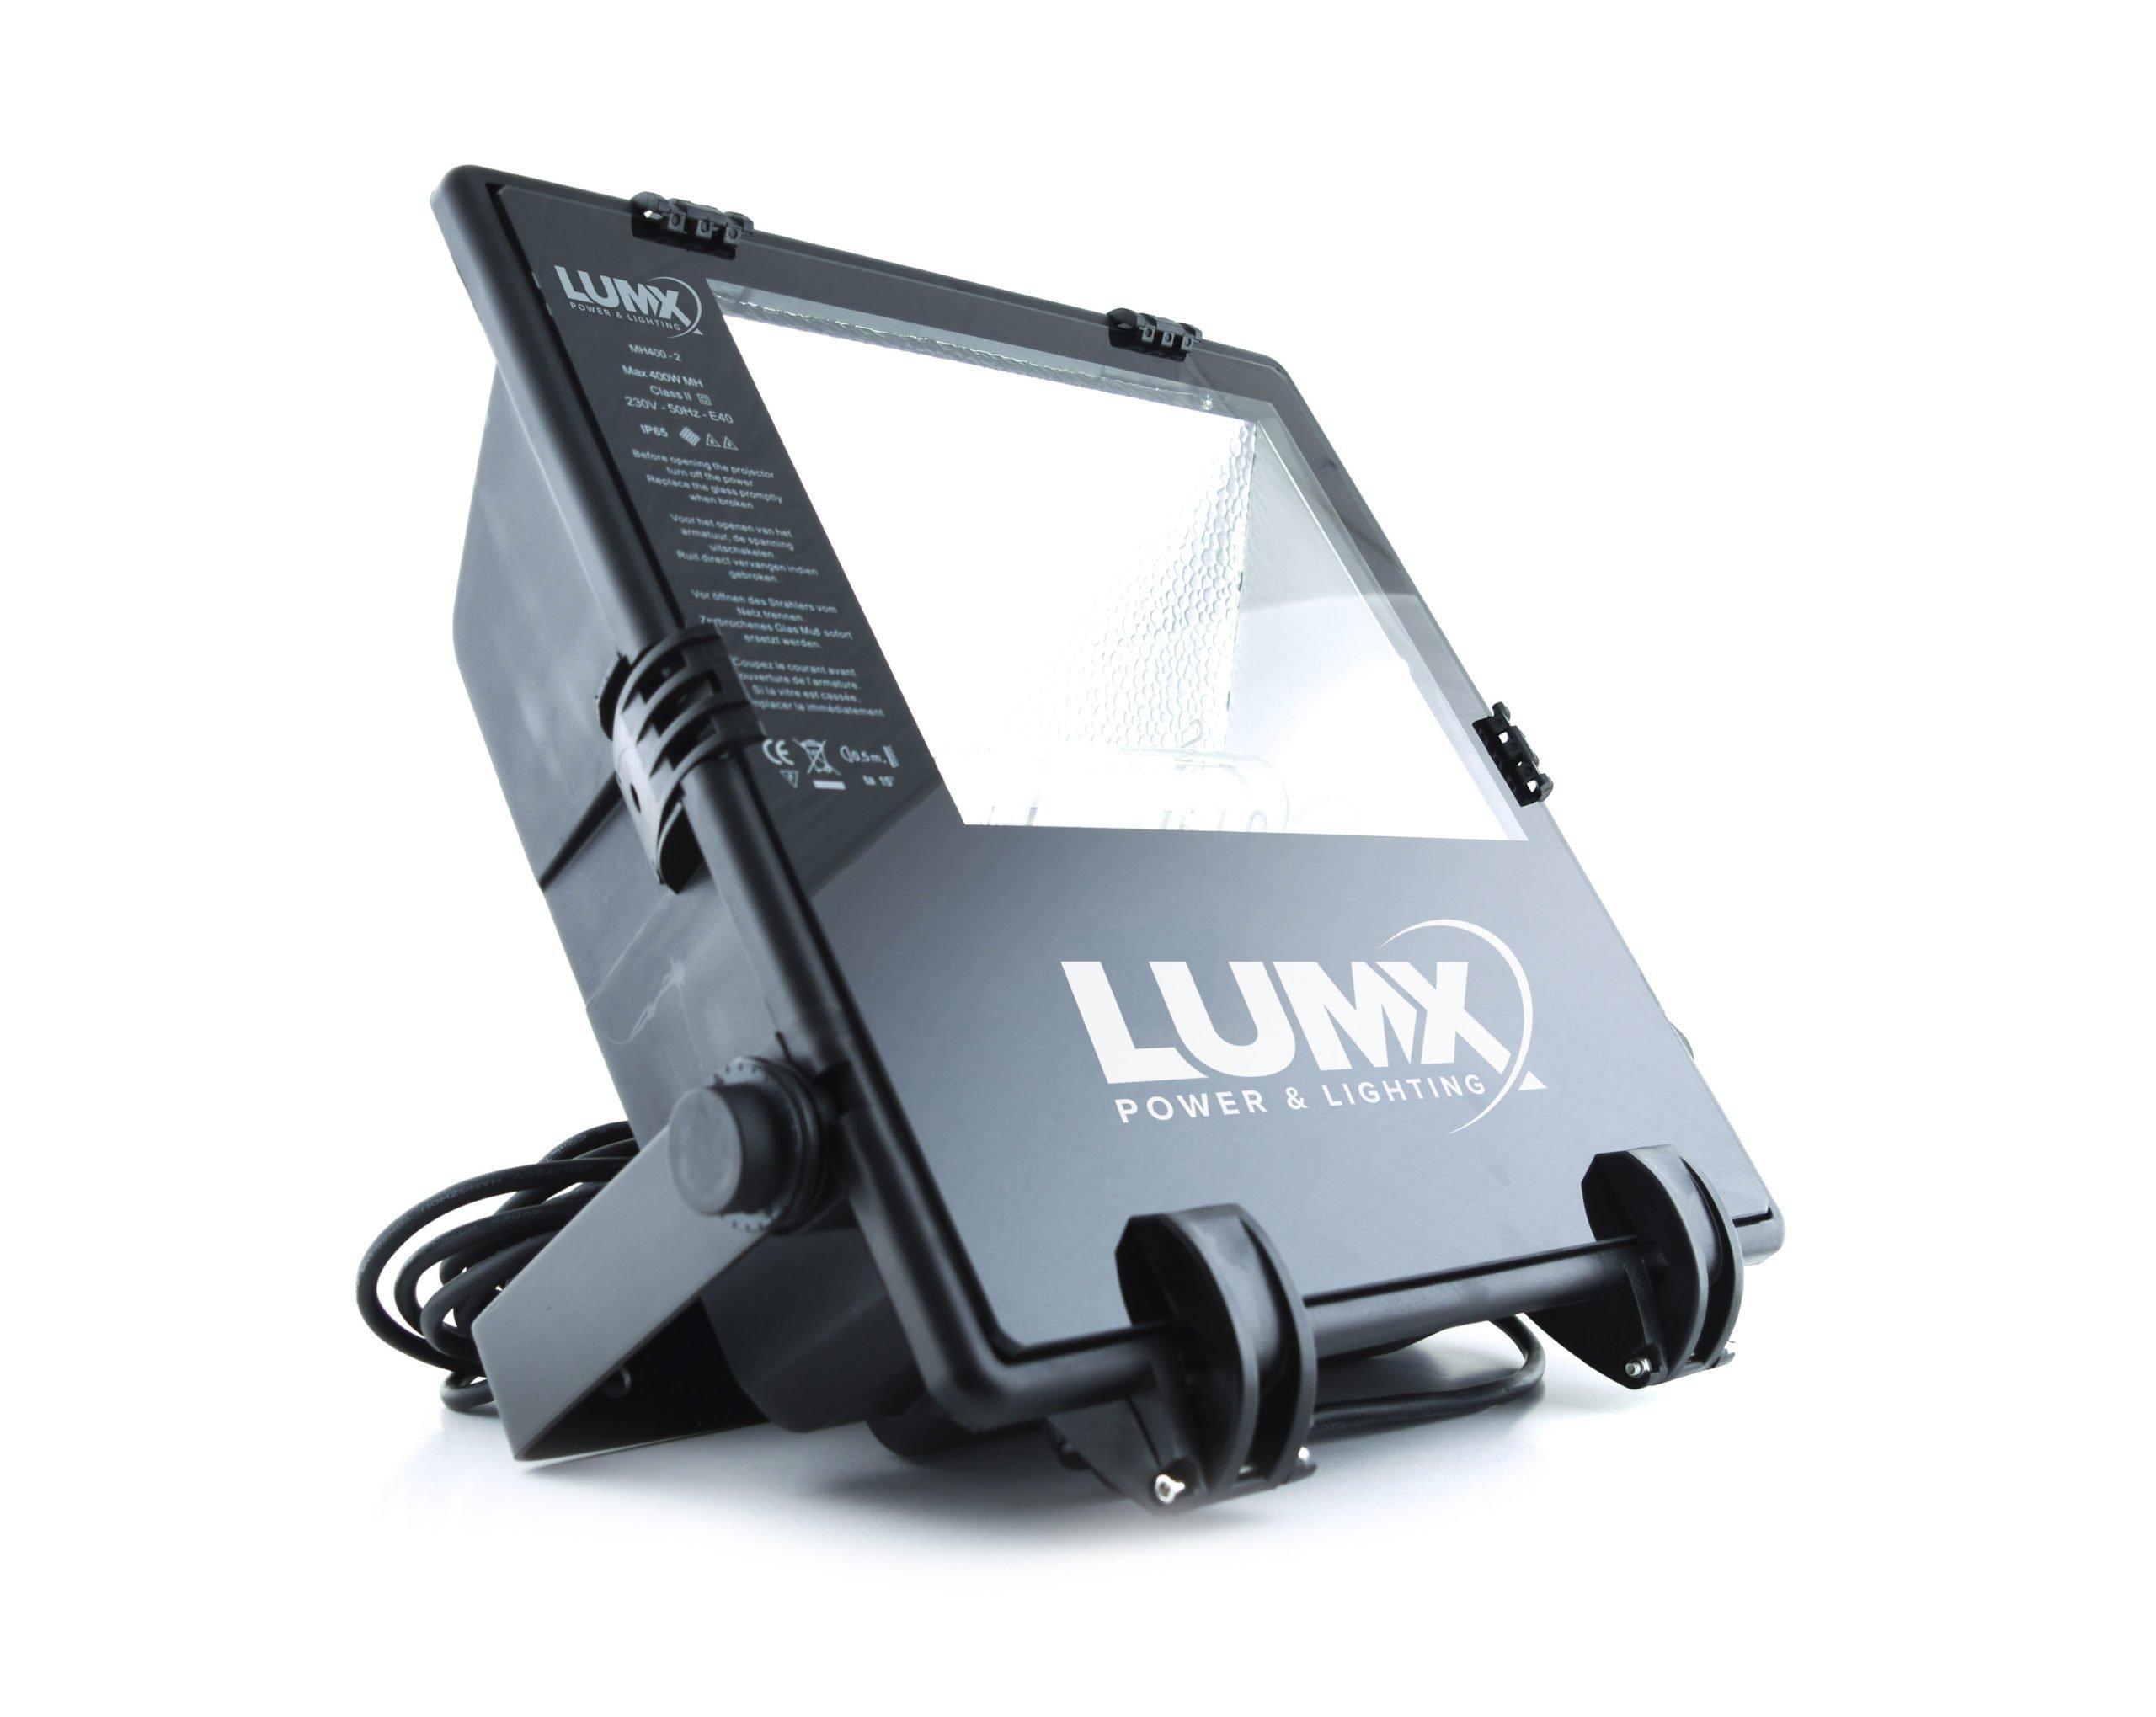 hqi-lamp-400watt-734